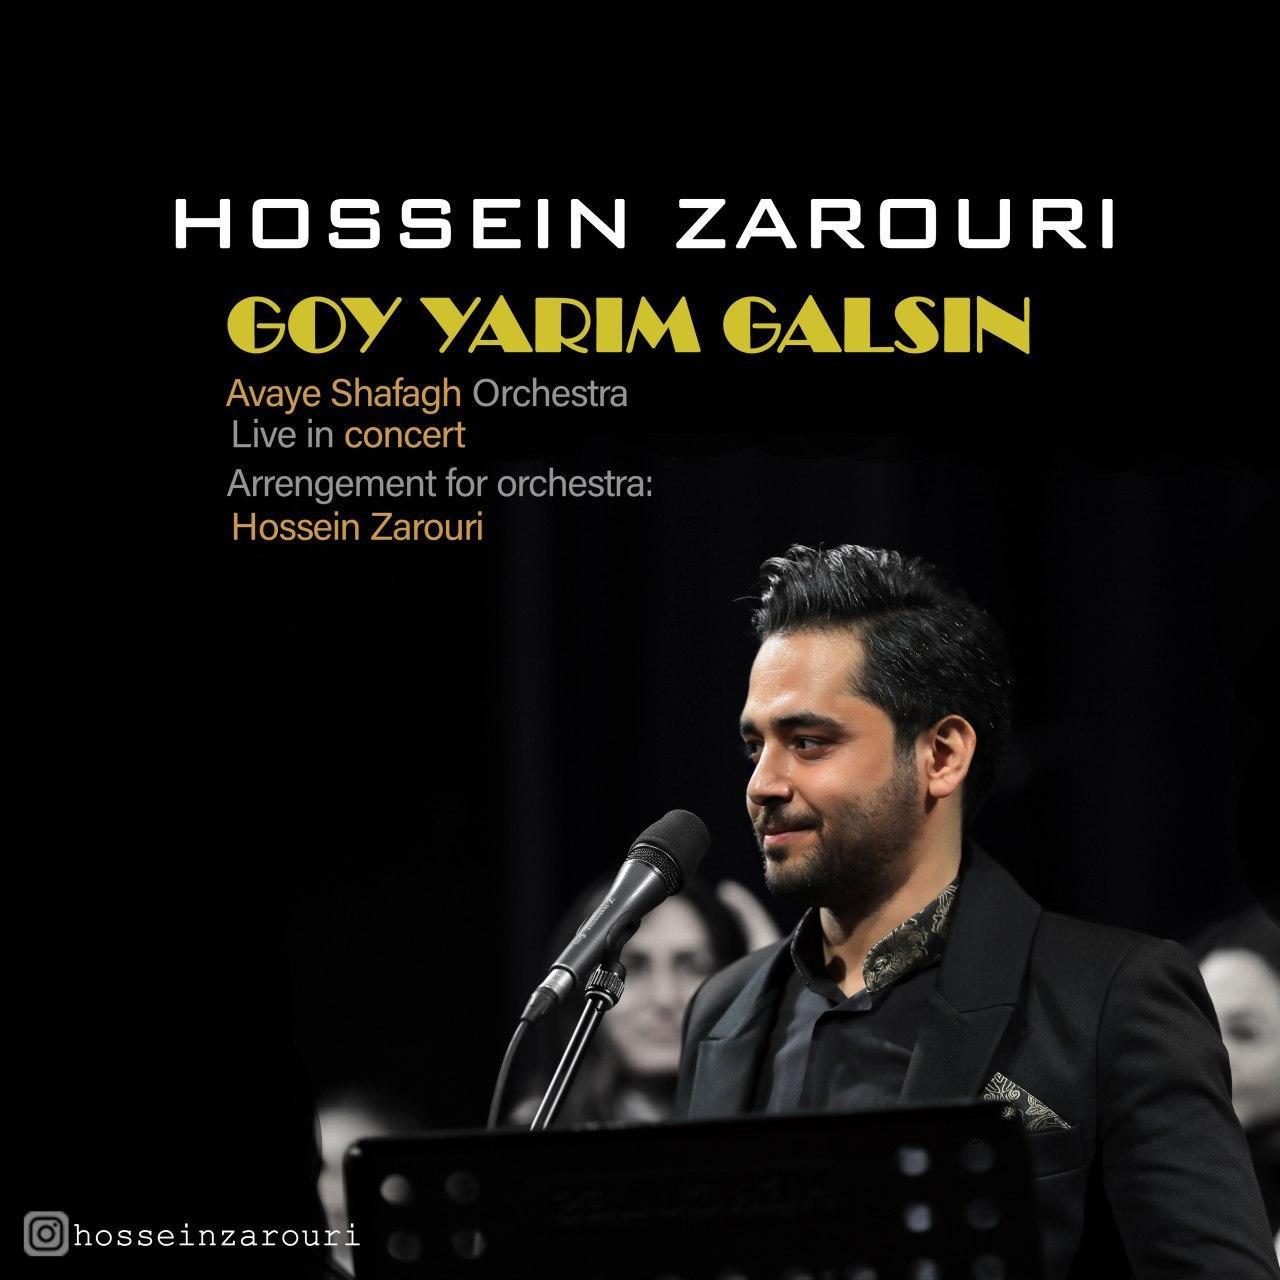 Hossein Zarouri – Goy Yarim Galsin